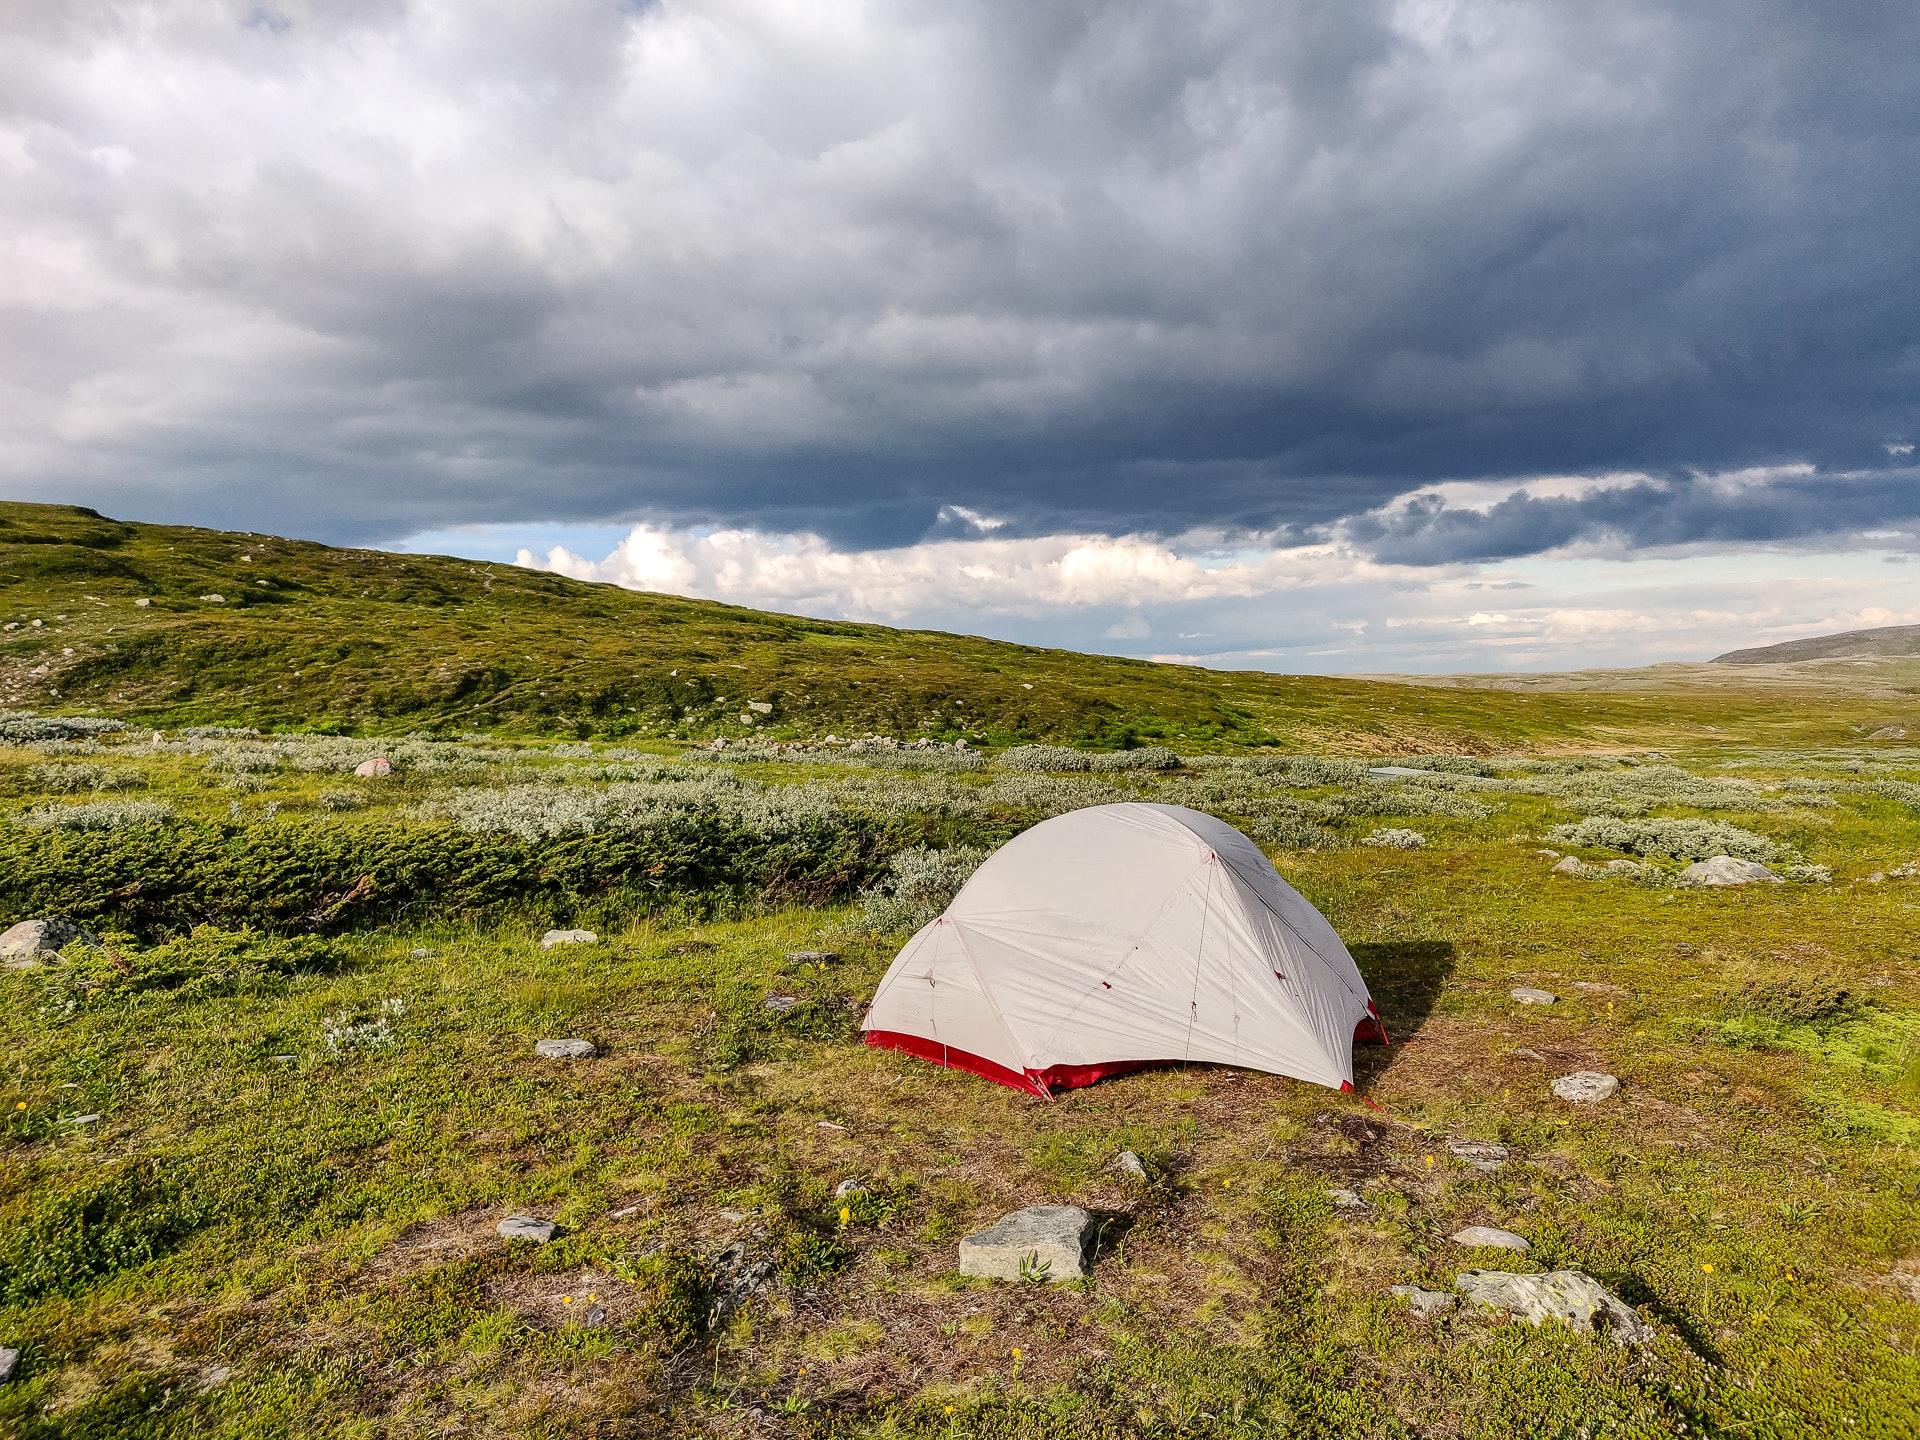 Incredible camping